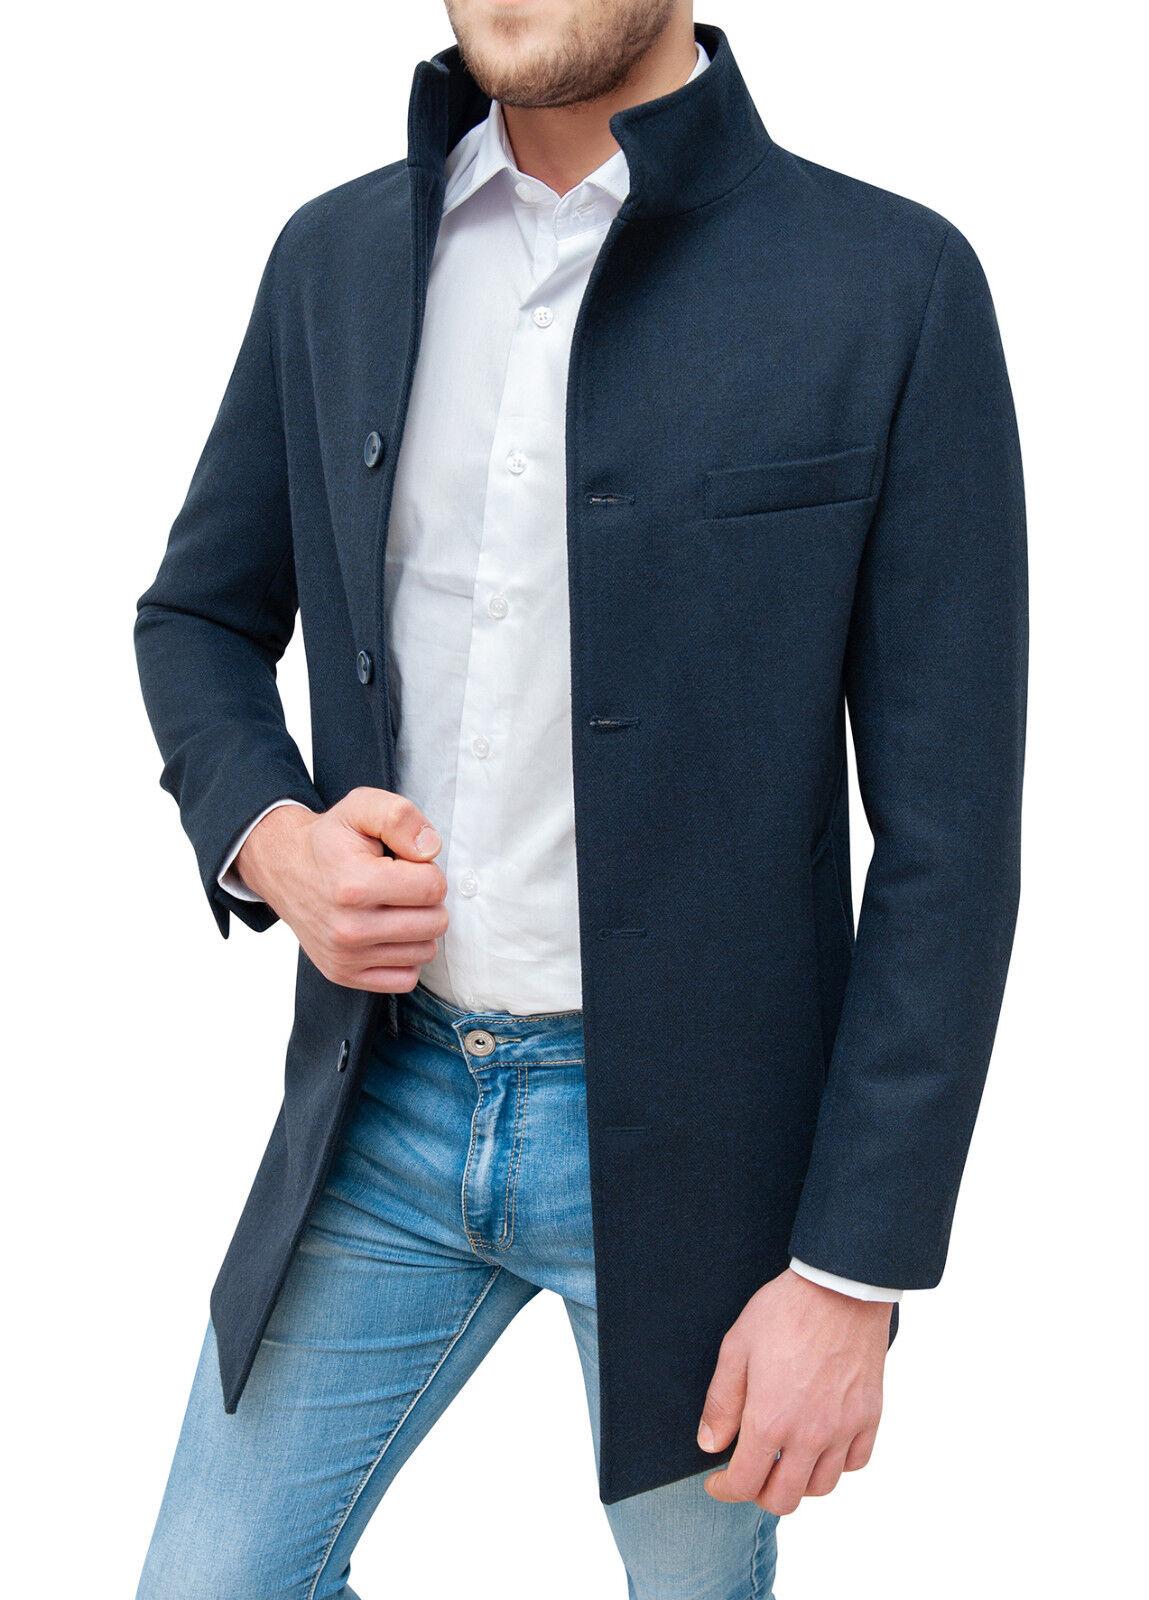 fae6b03c78fc6 Cappotto uomo sartoriale blu scuro slim fit casual elegante giacca  invernale.